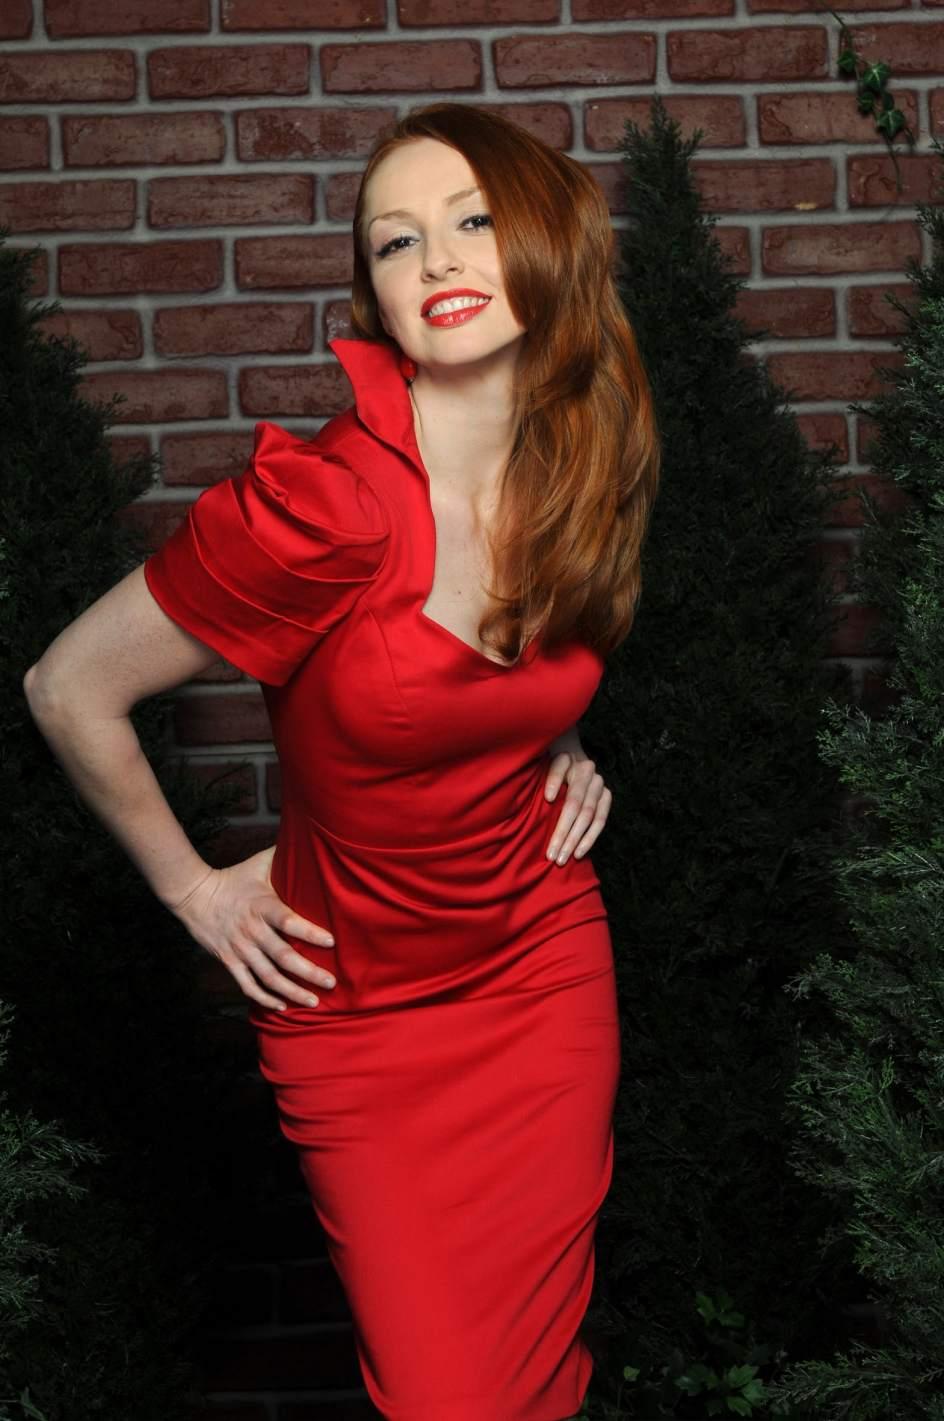 La actriz Cristina Castaño, que da vida a Judith, abandona 'La que ...